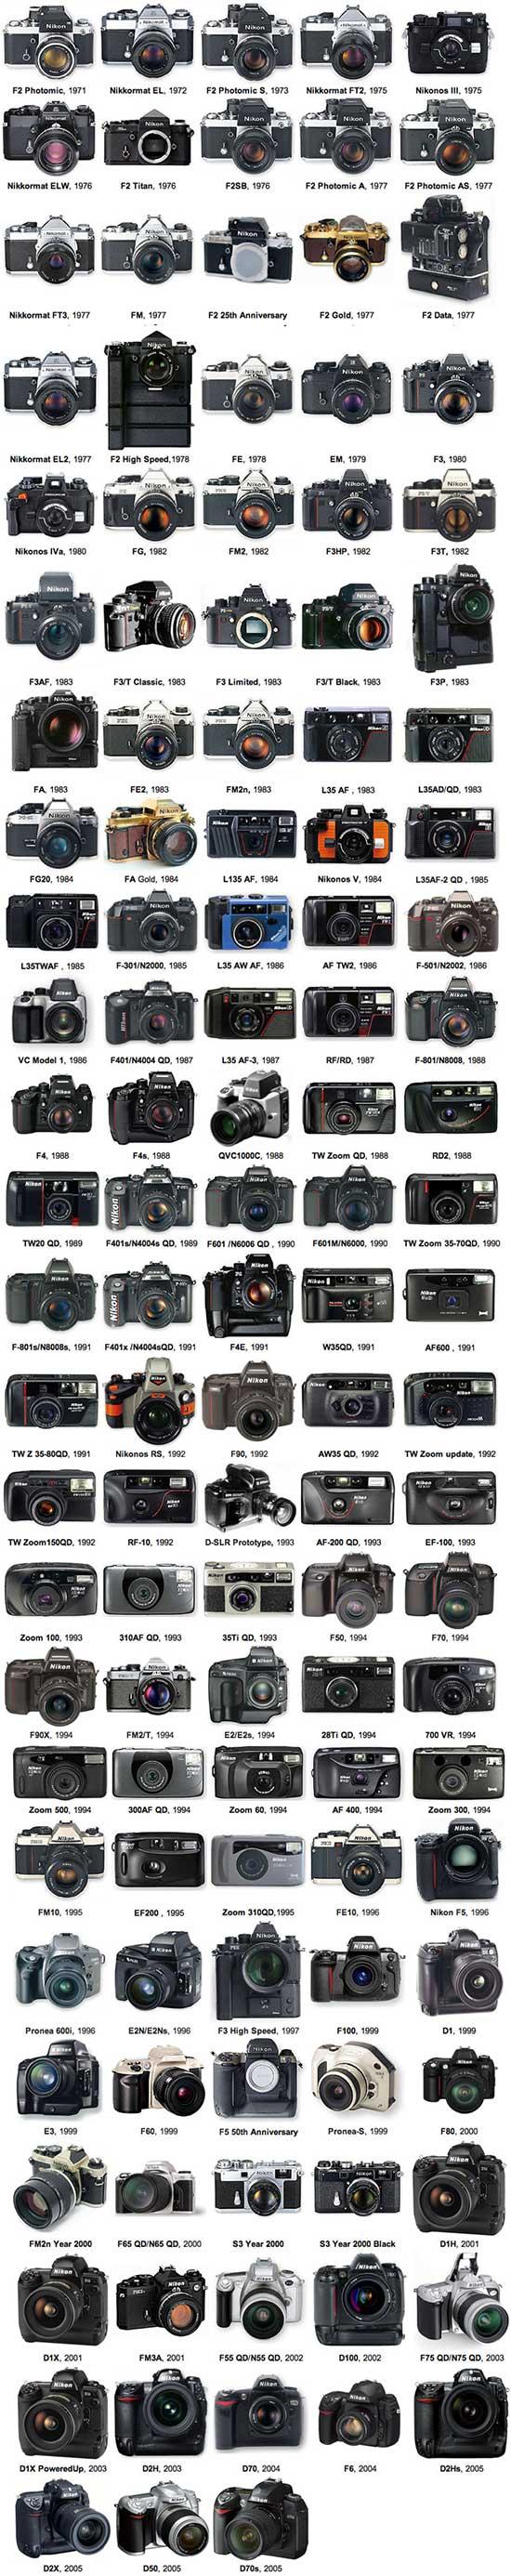 Nikon model's history